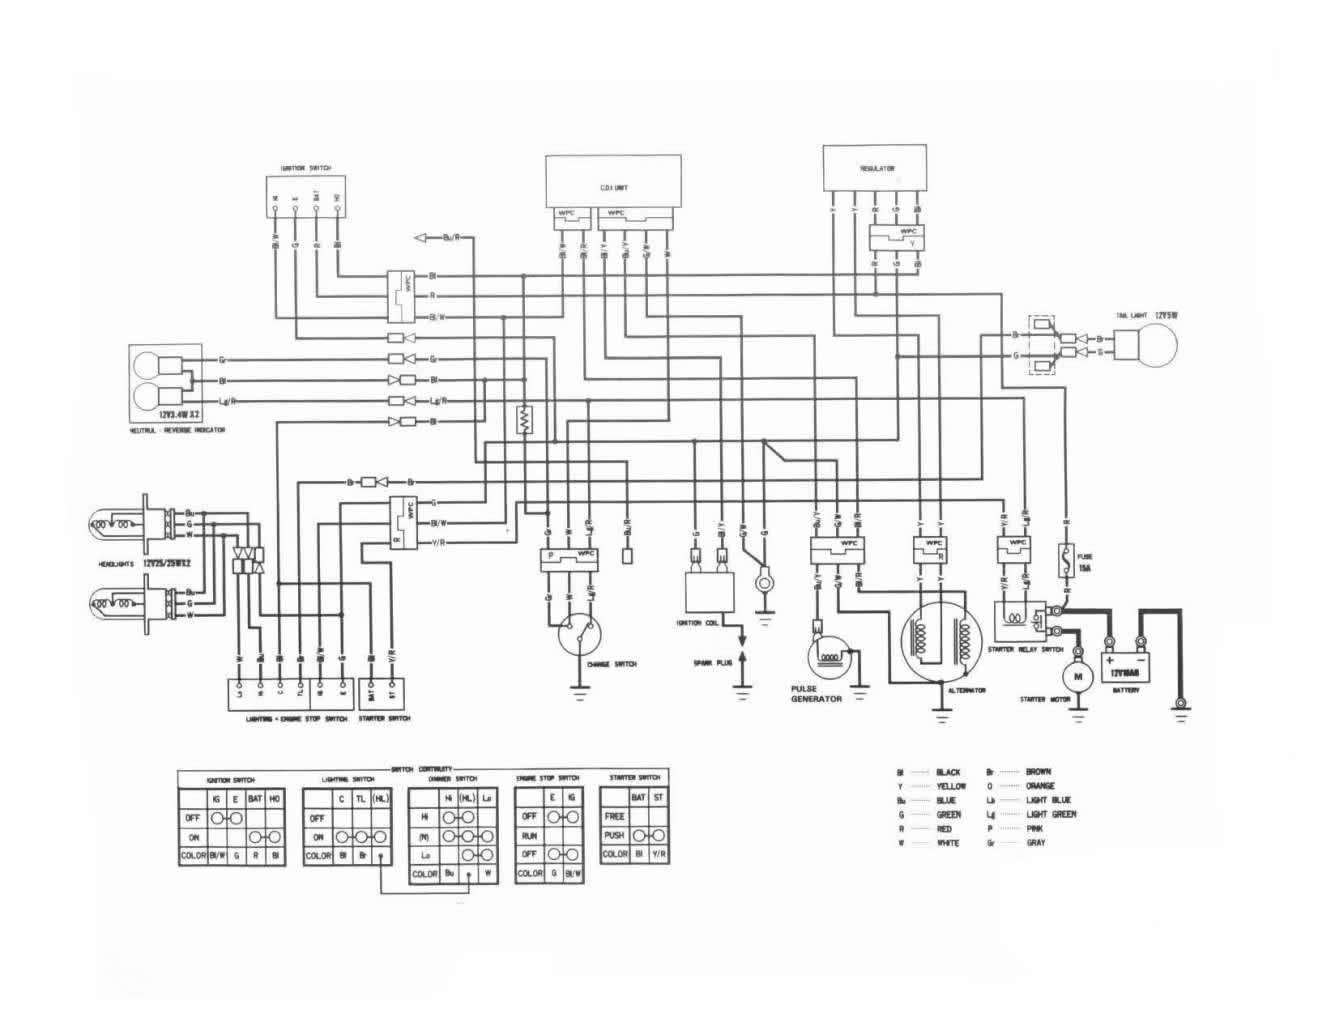 Honda Trx 250 Wiring Diagram Free Picture